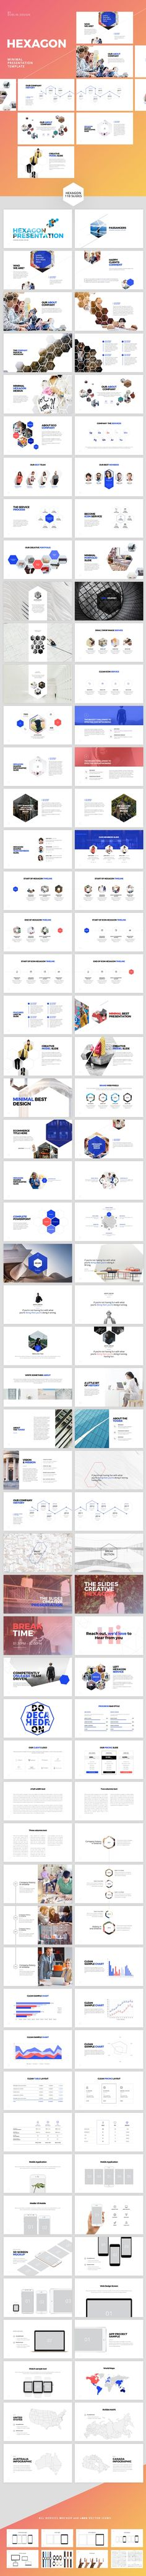 Hexagon Keynote Template — Keynote KEY #pitch • Download ➝ https://graphicriver.net/item/hexagon-keynote-template/19136024?ref=pxcr